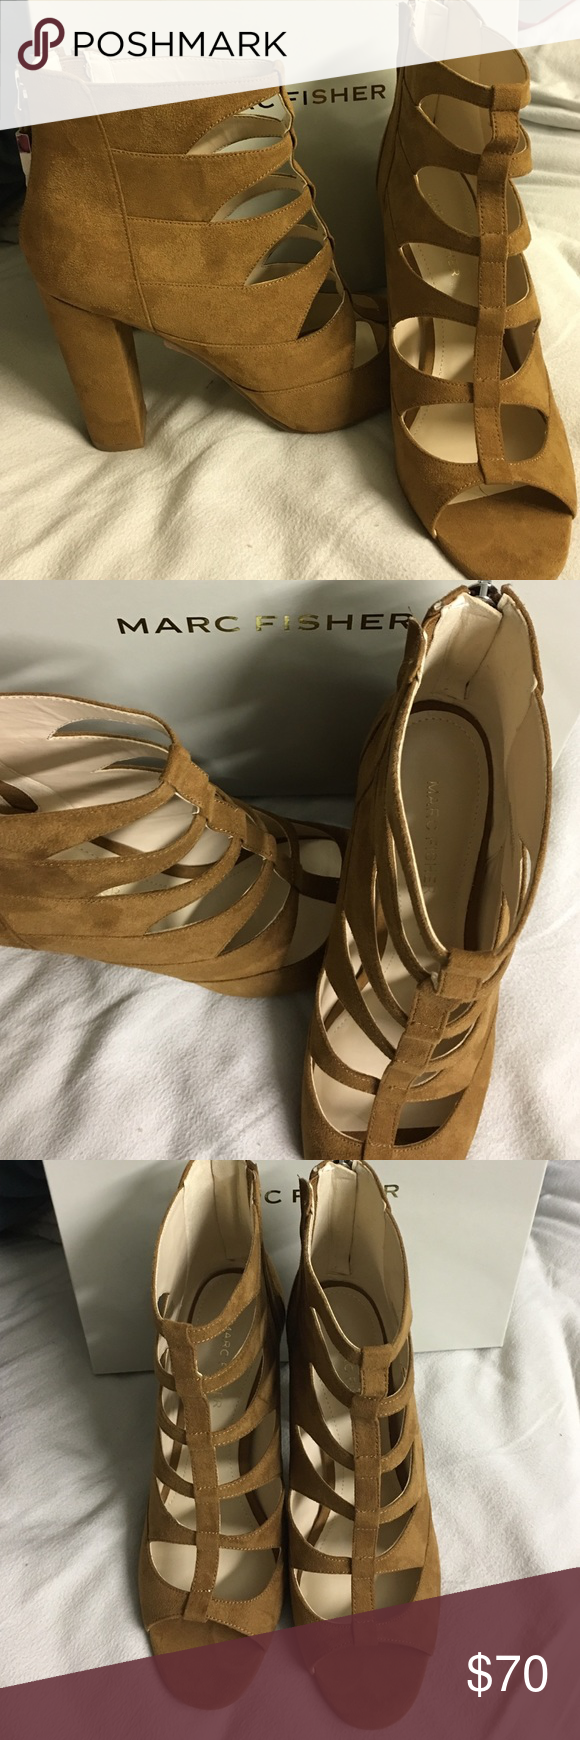 Brand new marc fisher pumps. Super cute 😍😍 Brand new marc fisher pumps. Super cute 😍😍 Marc Fisher Shoes